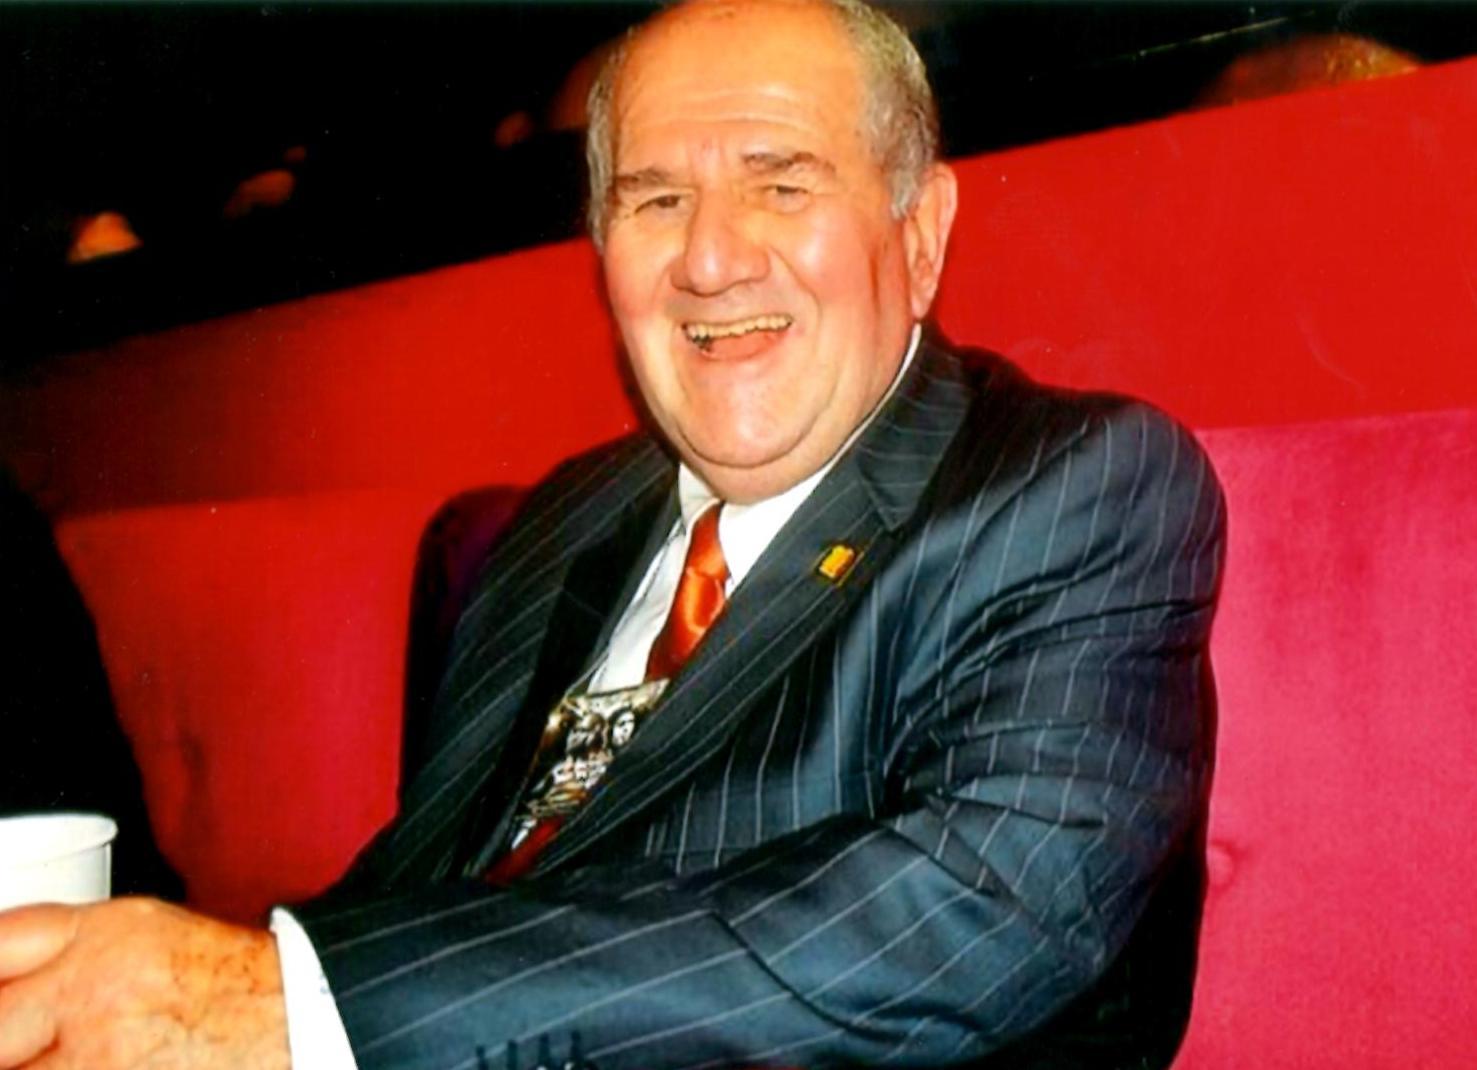 Famed Boxing Judge and HBO Announcer Harold Lederman *(PHOTO BY ALEX RINALDI)